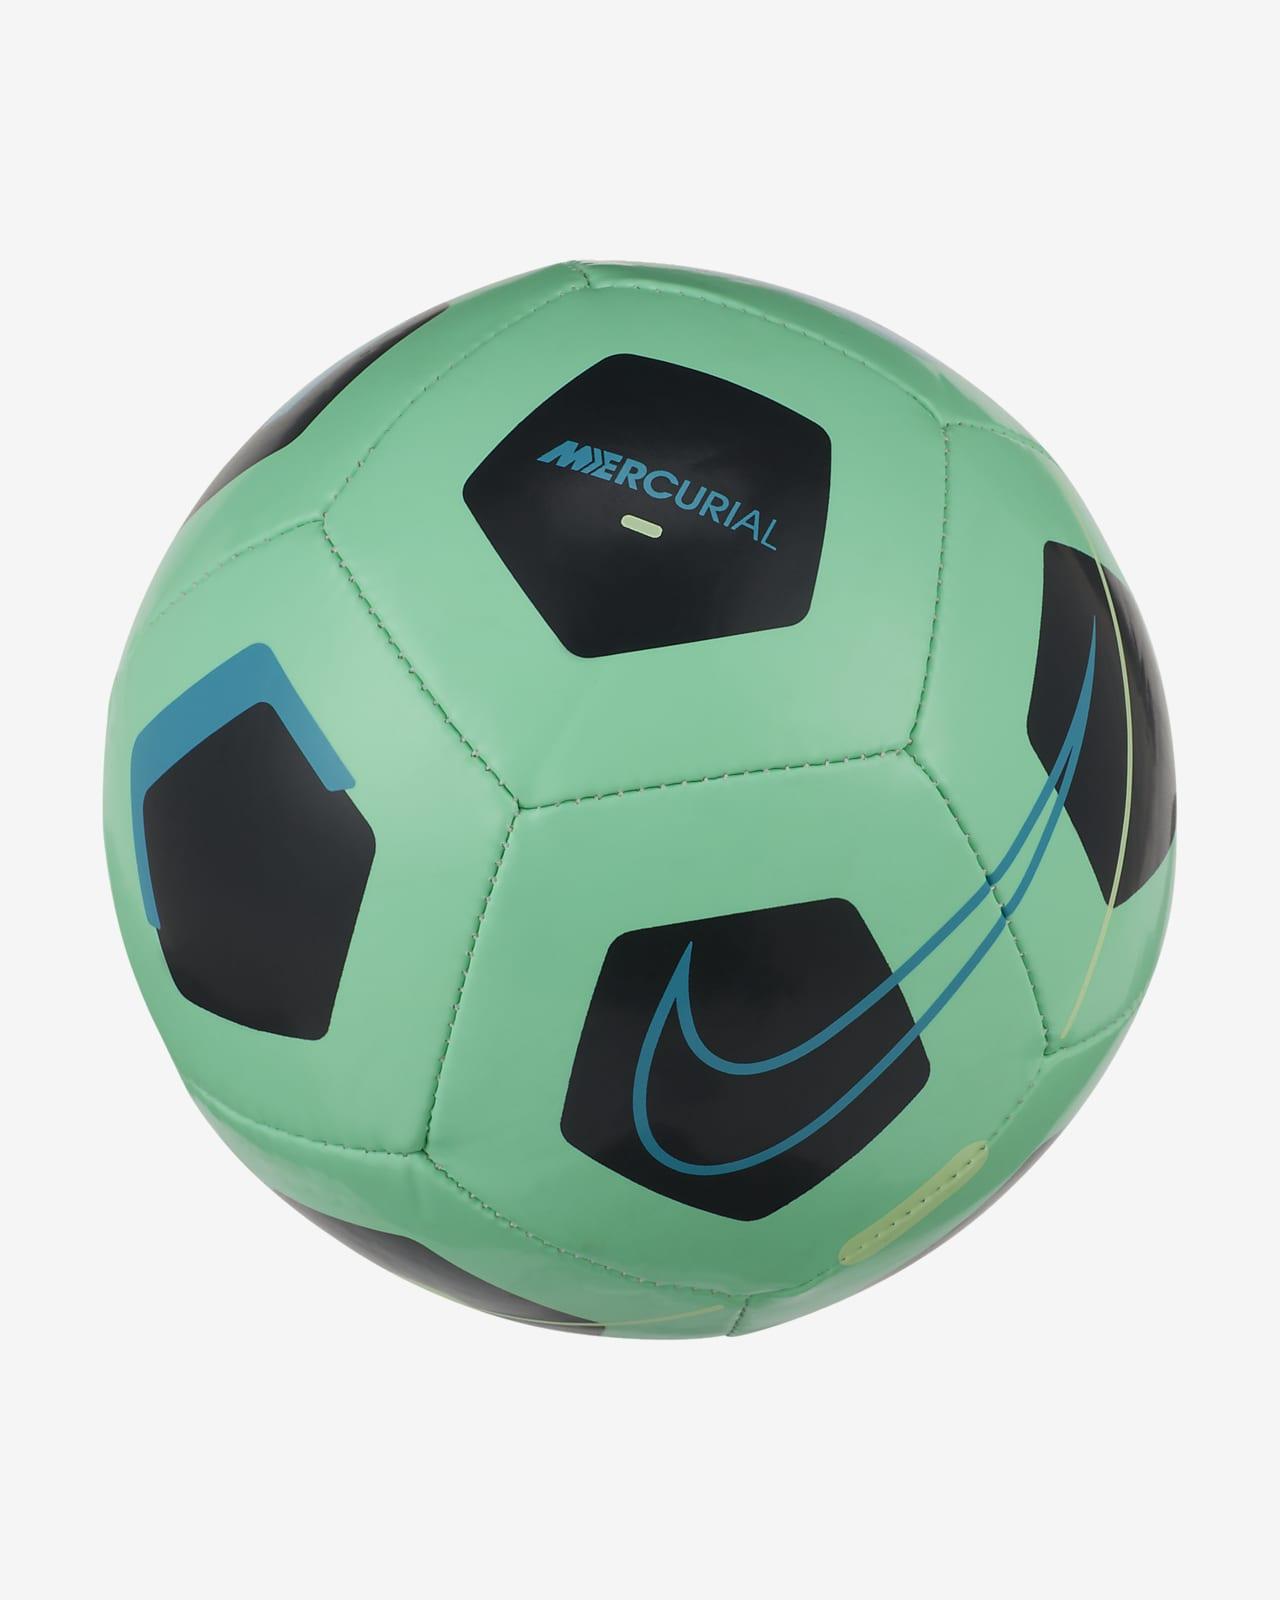 Nike Mercurial Skills Soccer Ball